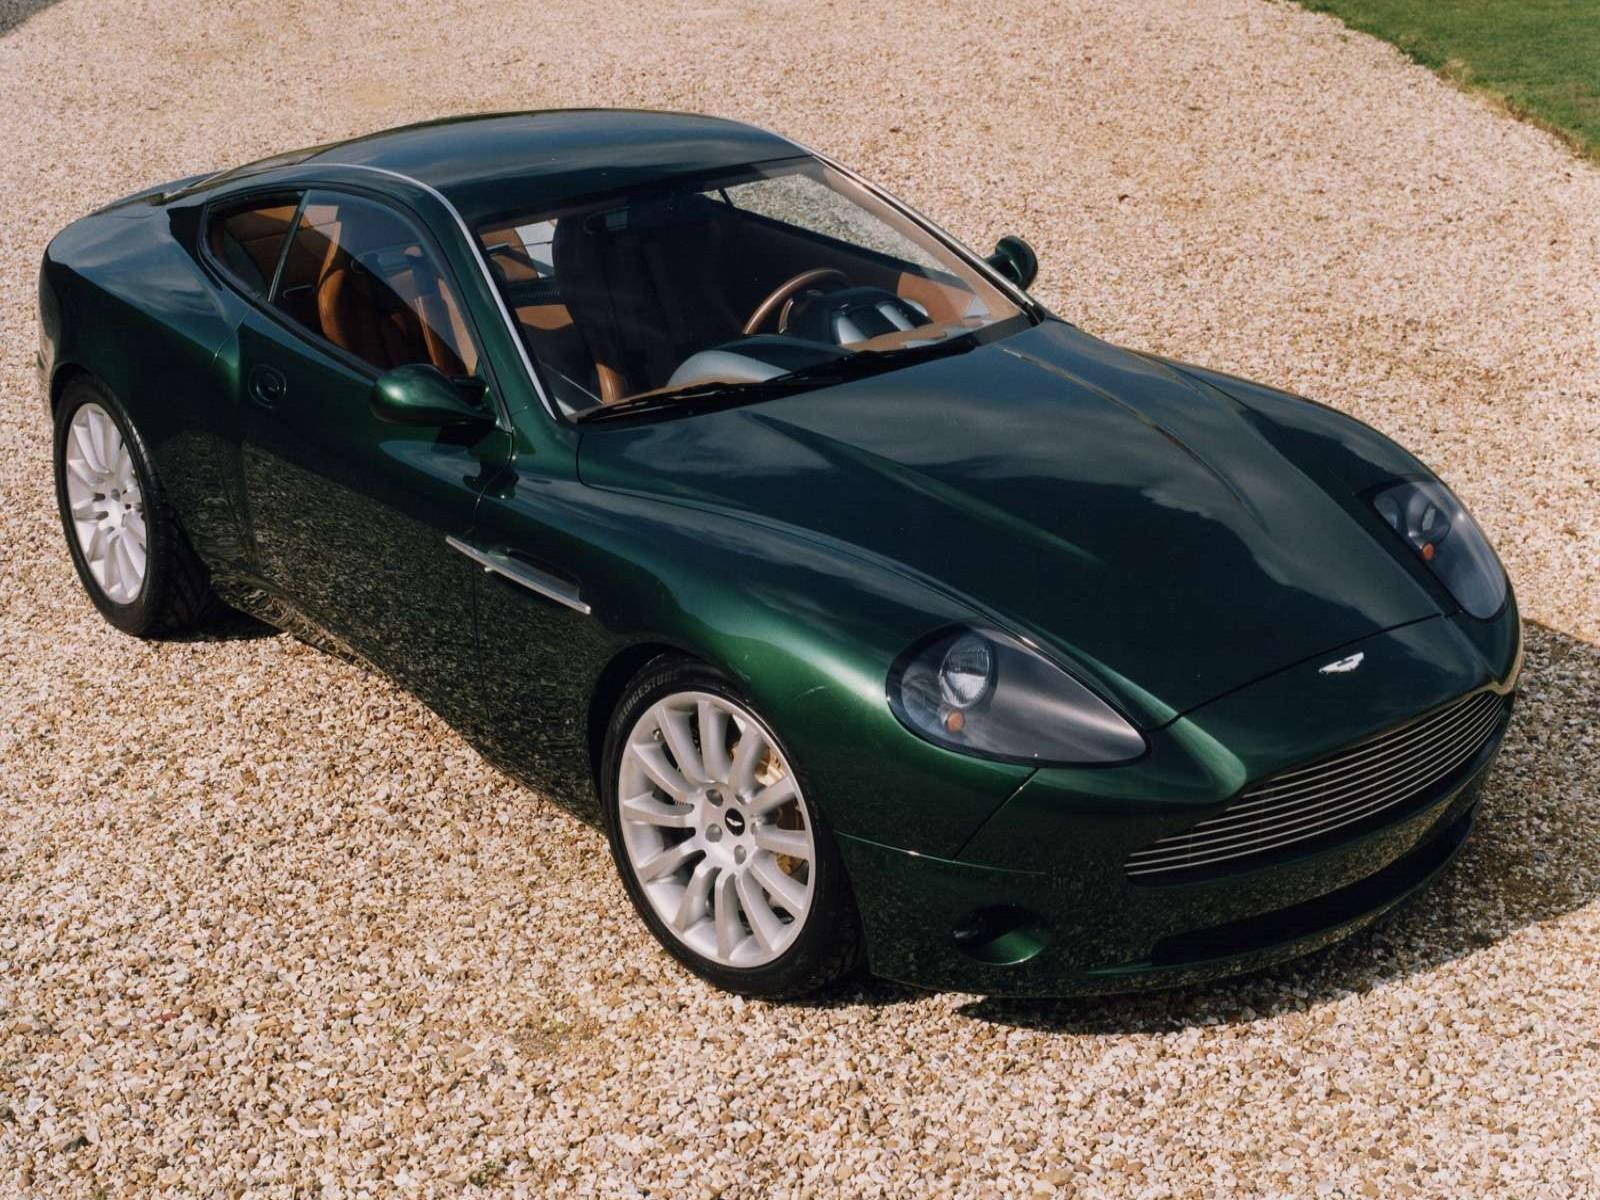 Boehmoeh: 1998 Aston Martin Project Vantage Concept Car